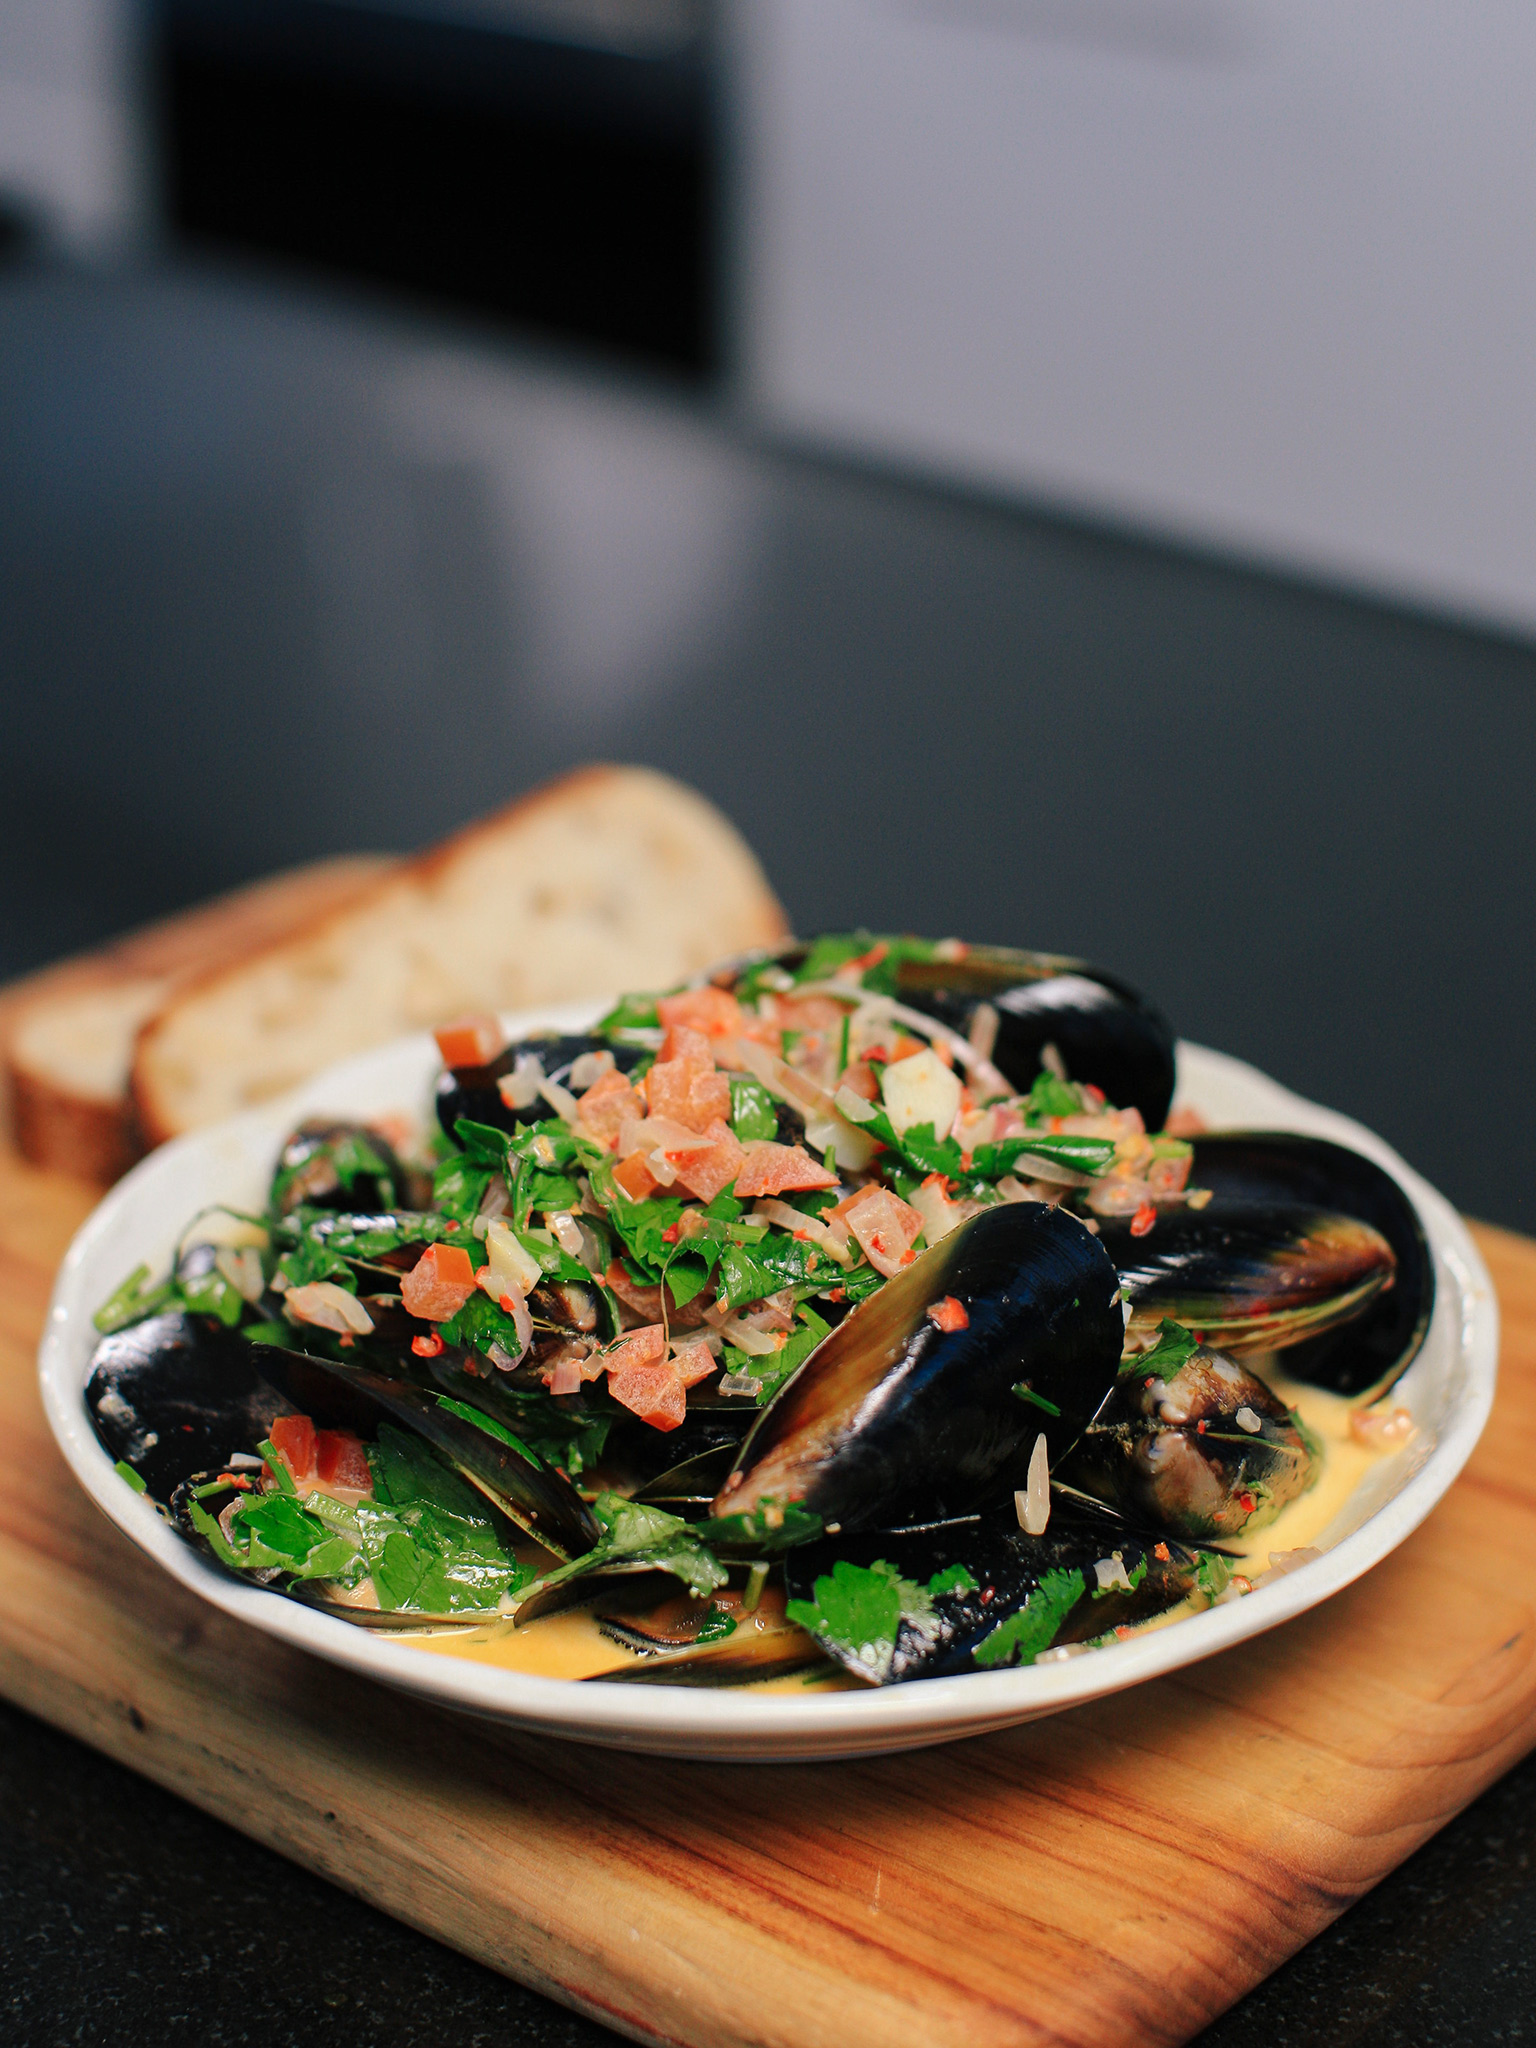 3-006-Peri-Peri-Mussels-004-web.jpg